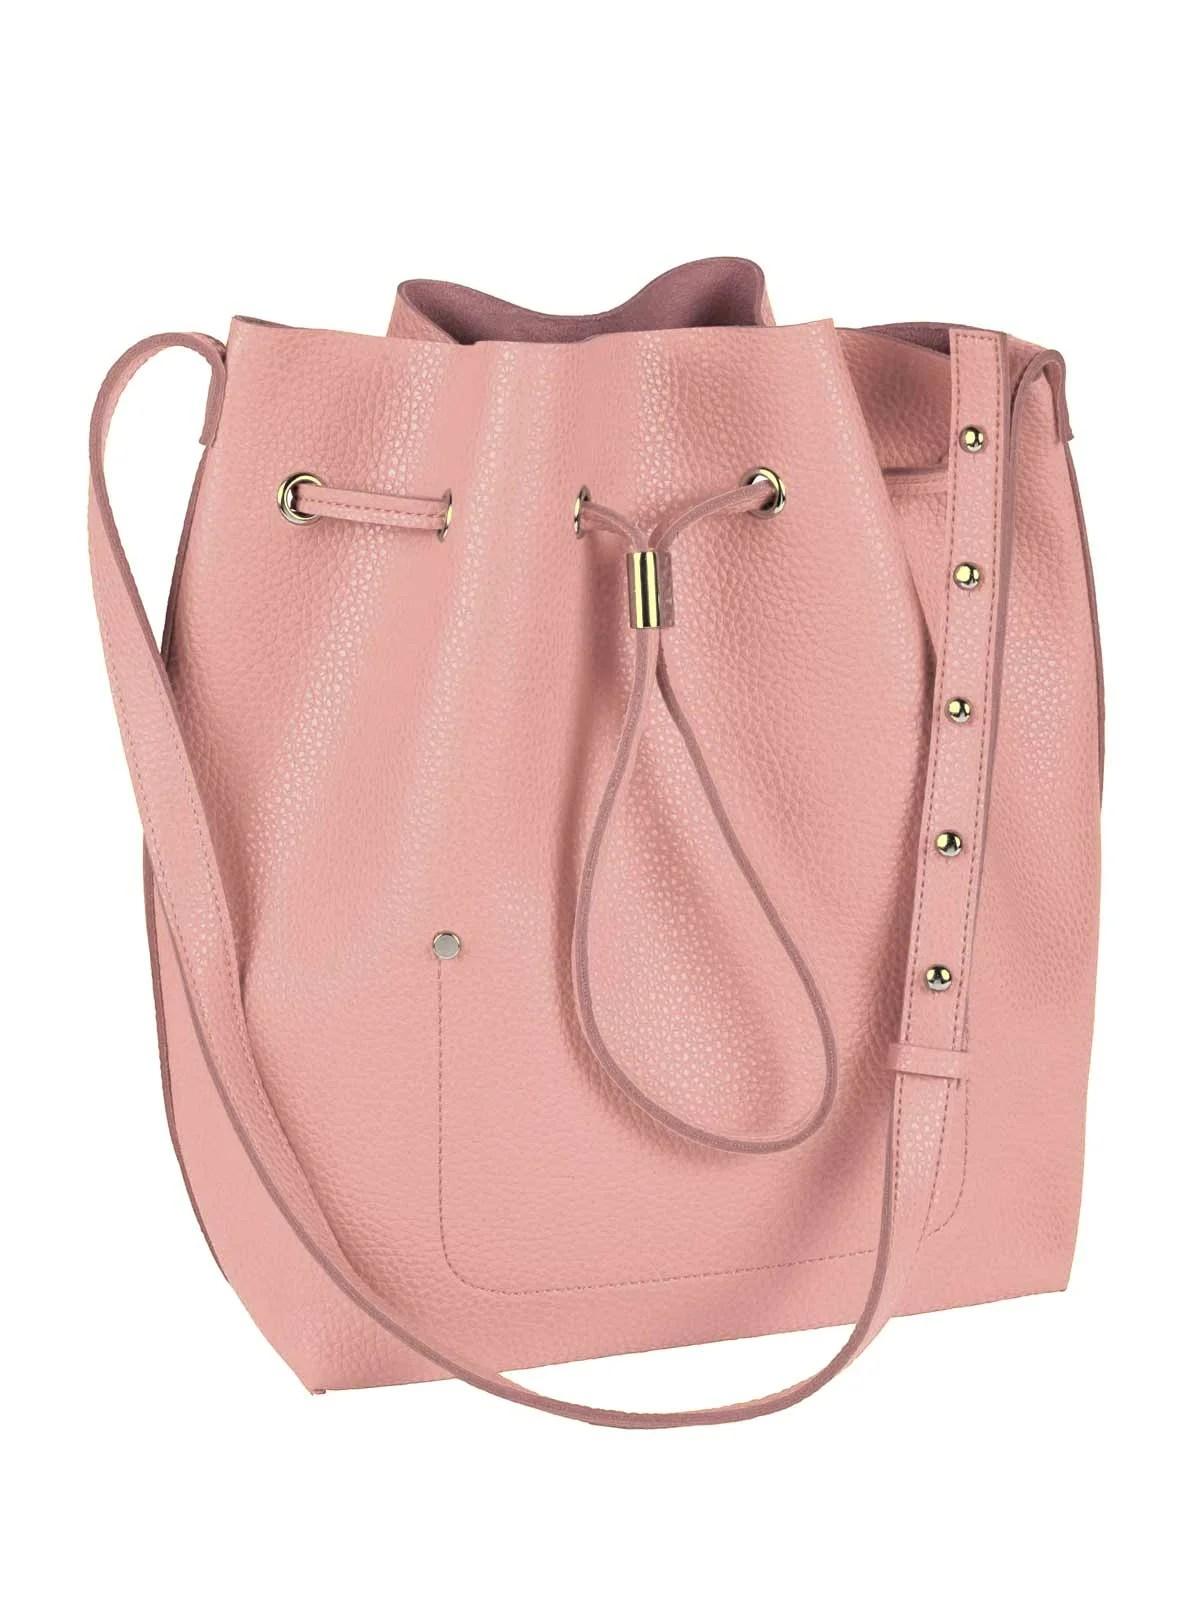 690.526 HEINE Damen Designer-Lederimitat-Tasche Rosé